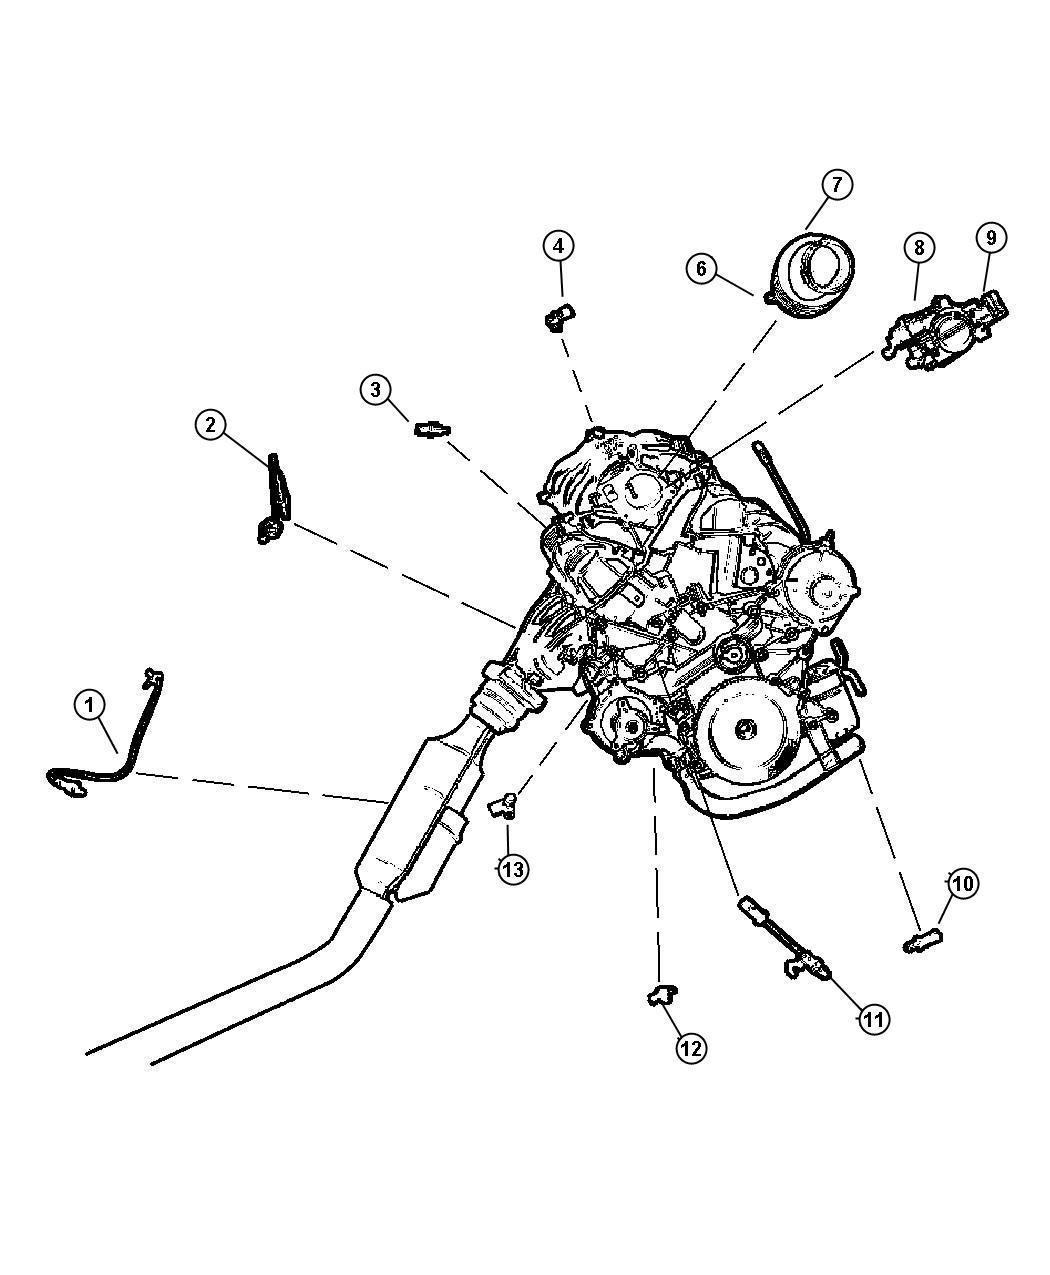 Voyager Sensors Engine 3 3 3 8 Ega Egh Egm